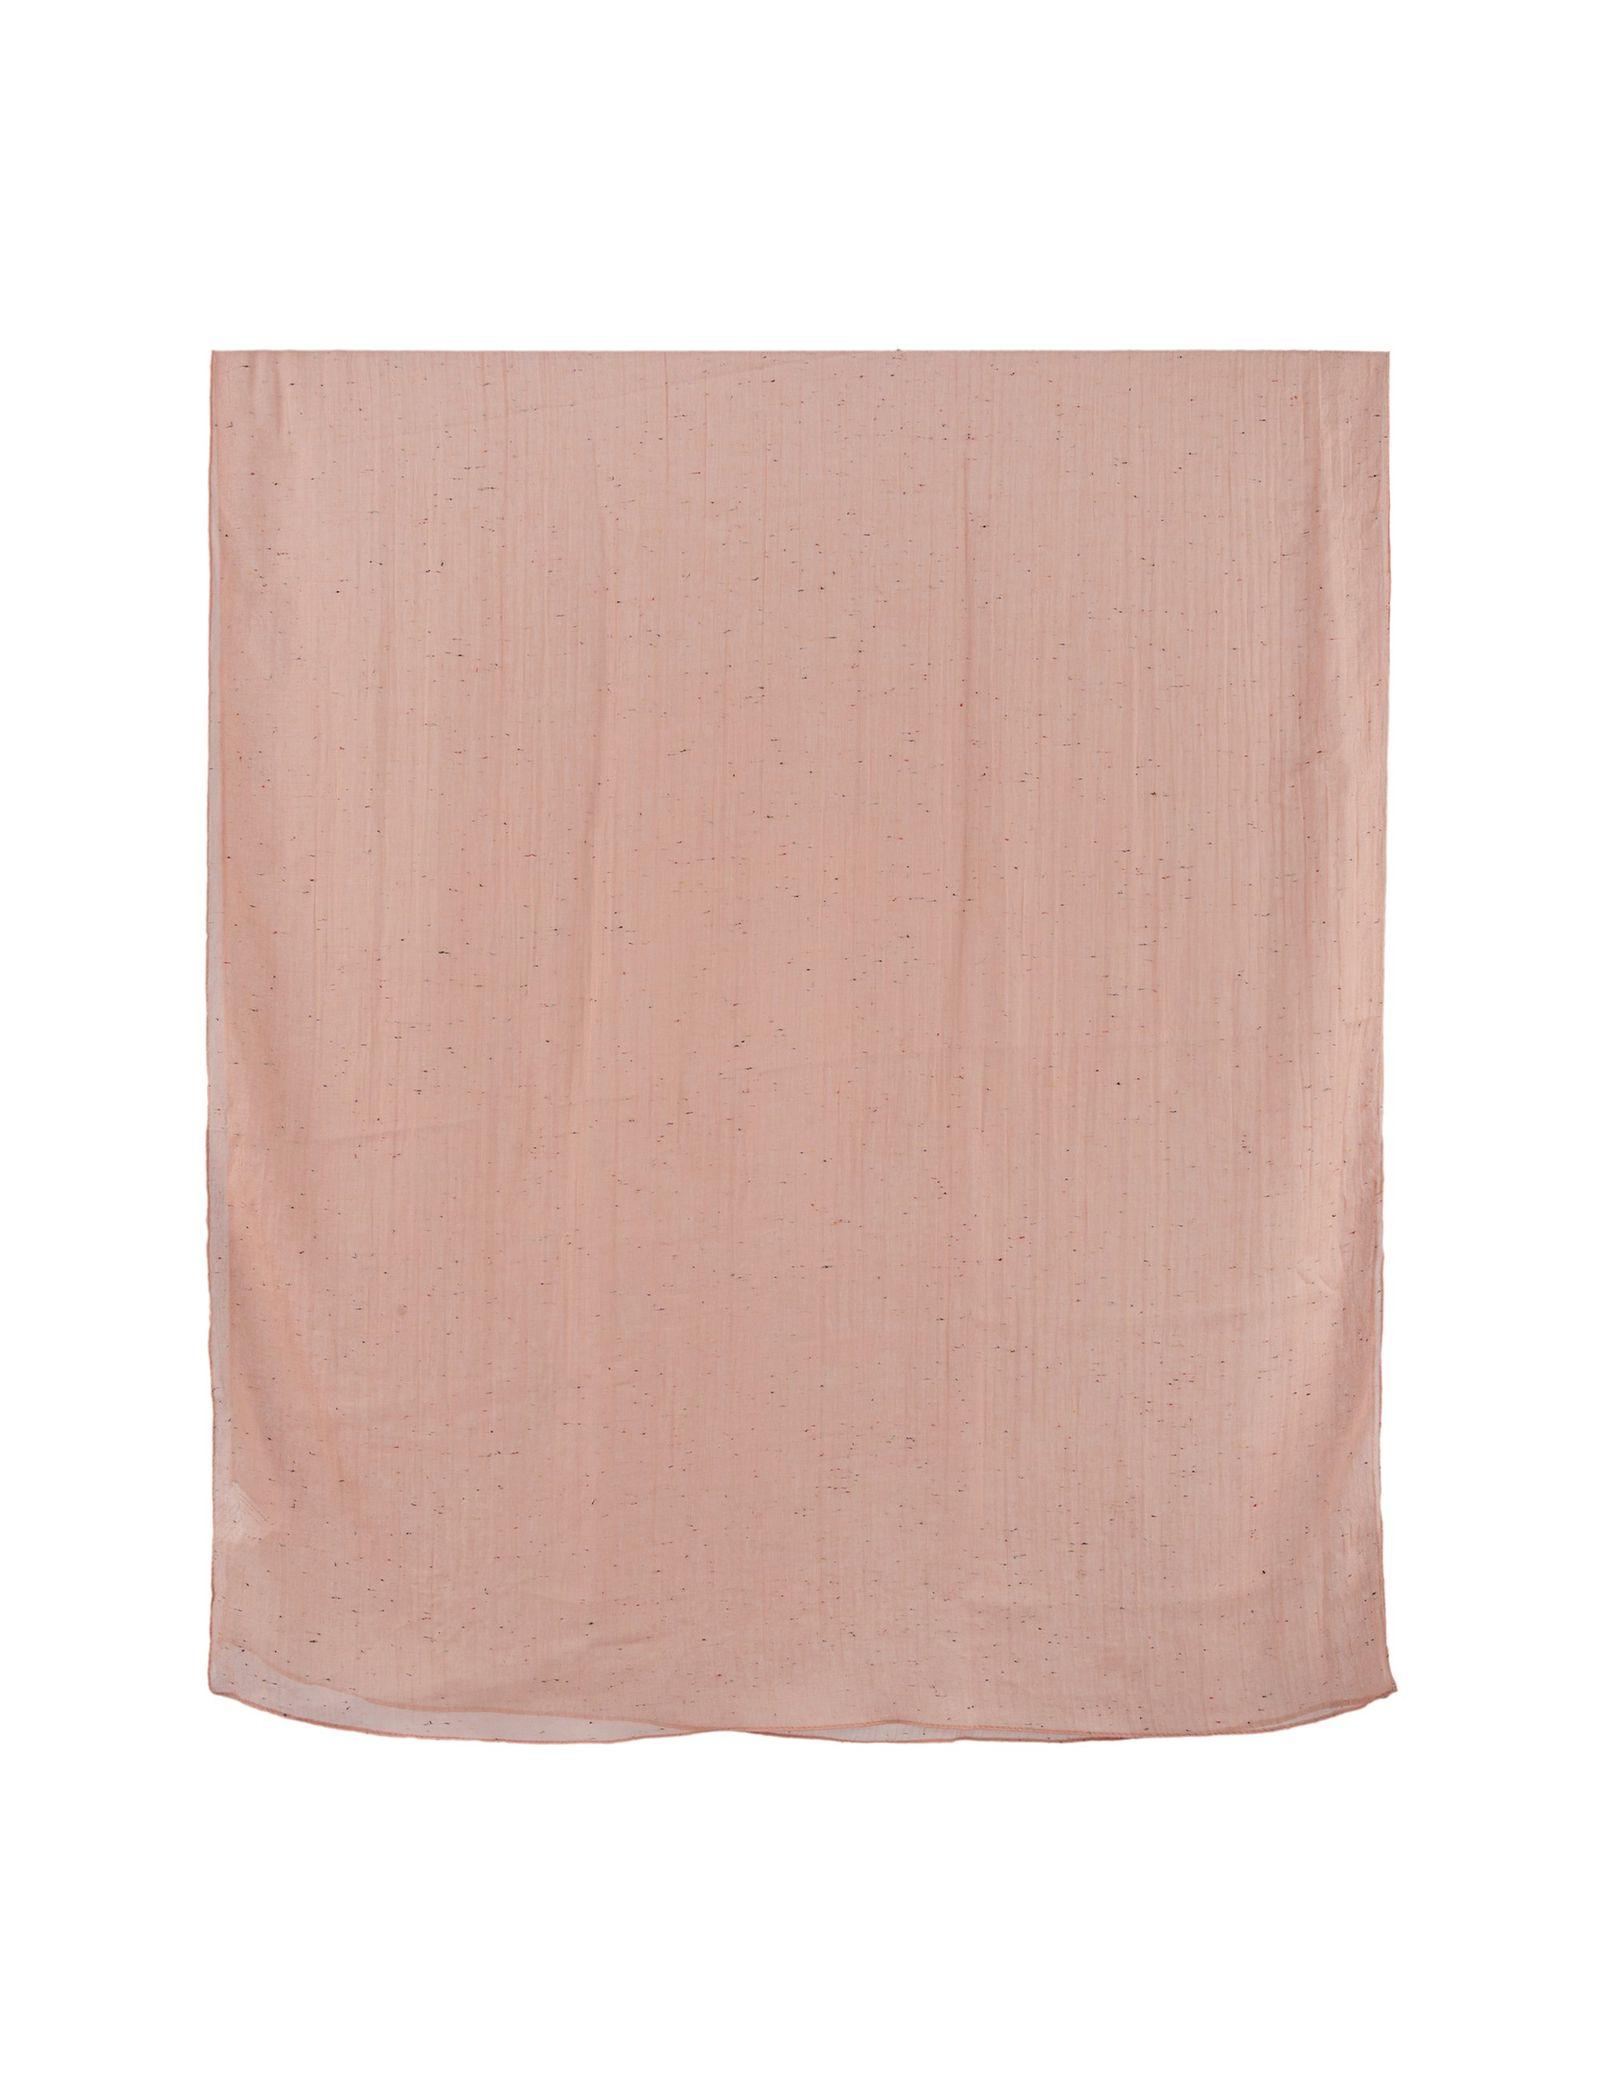 شال طرح دار زنانه - پونت روما - هلويي - 2